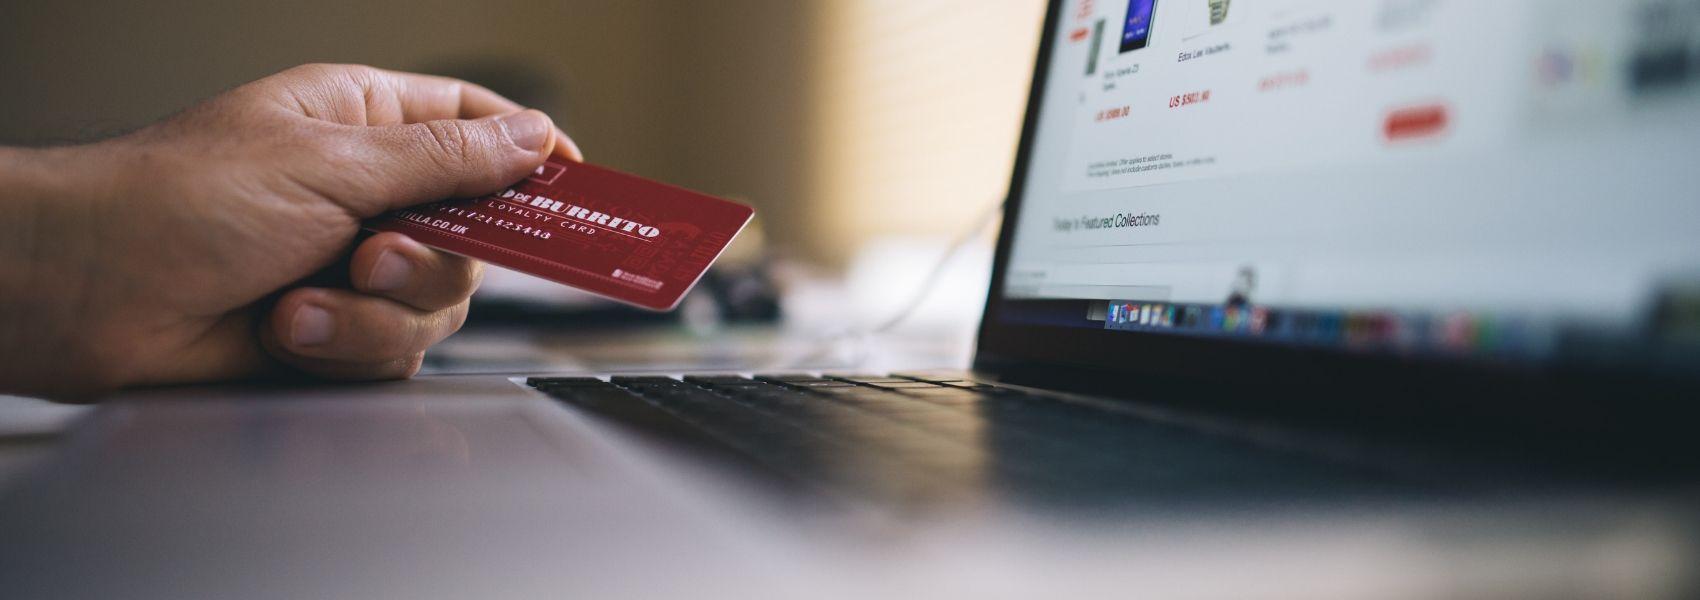 Infarmed alerta para compra de medicamentos através da Internet